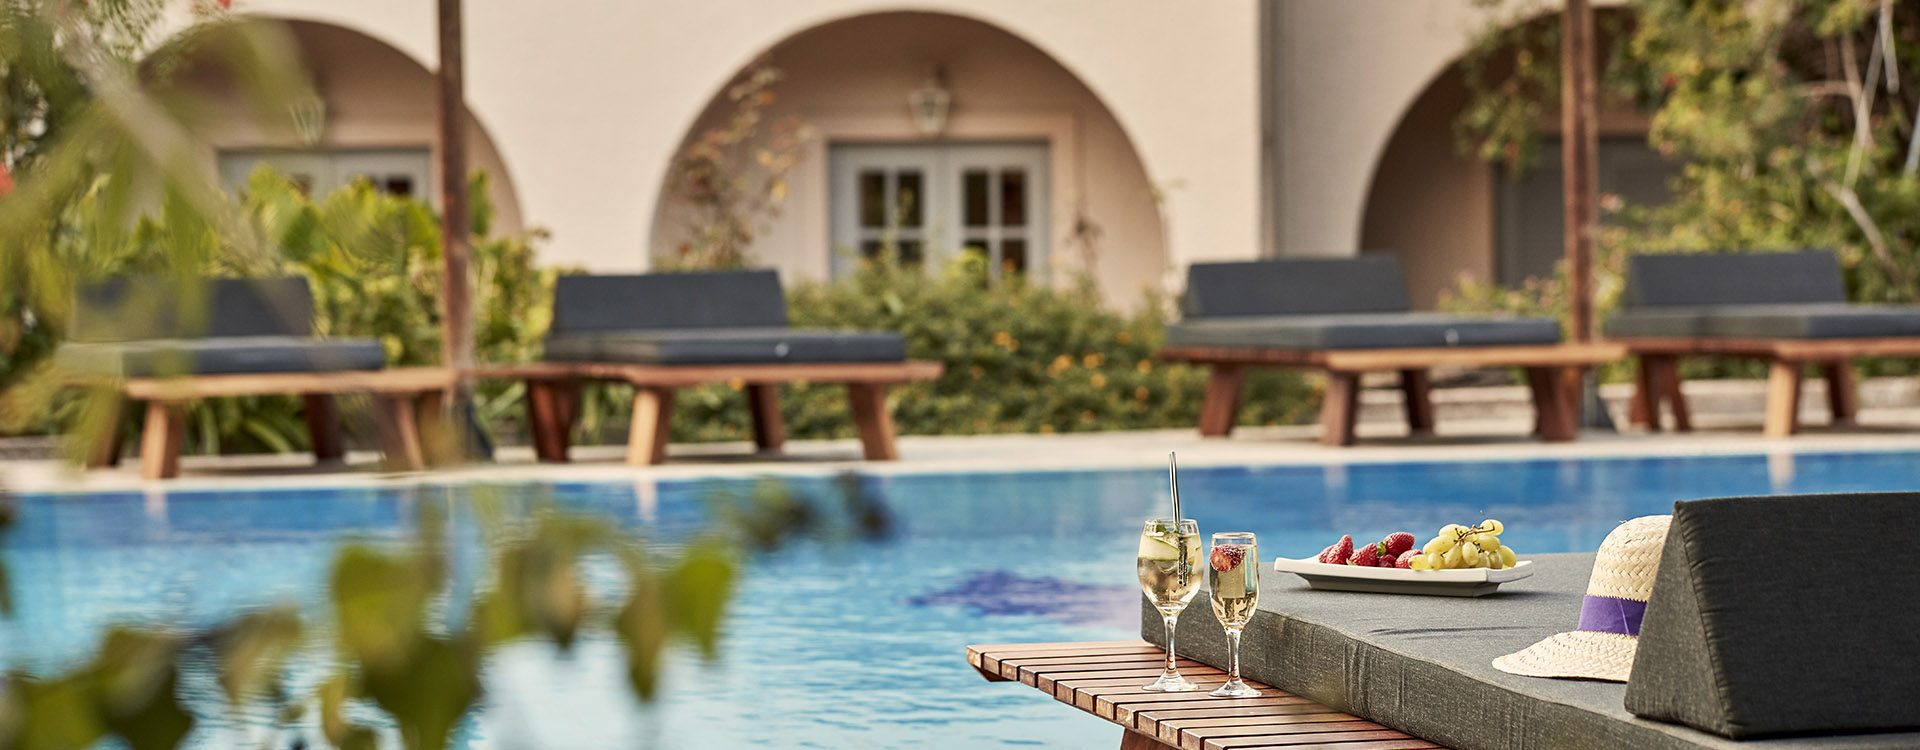 aegina hotels - Angelina Aegina Boutique Escape